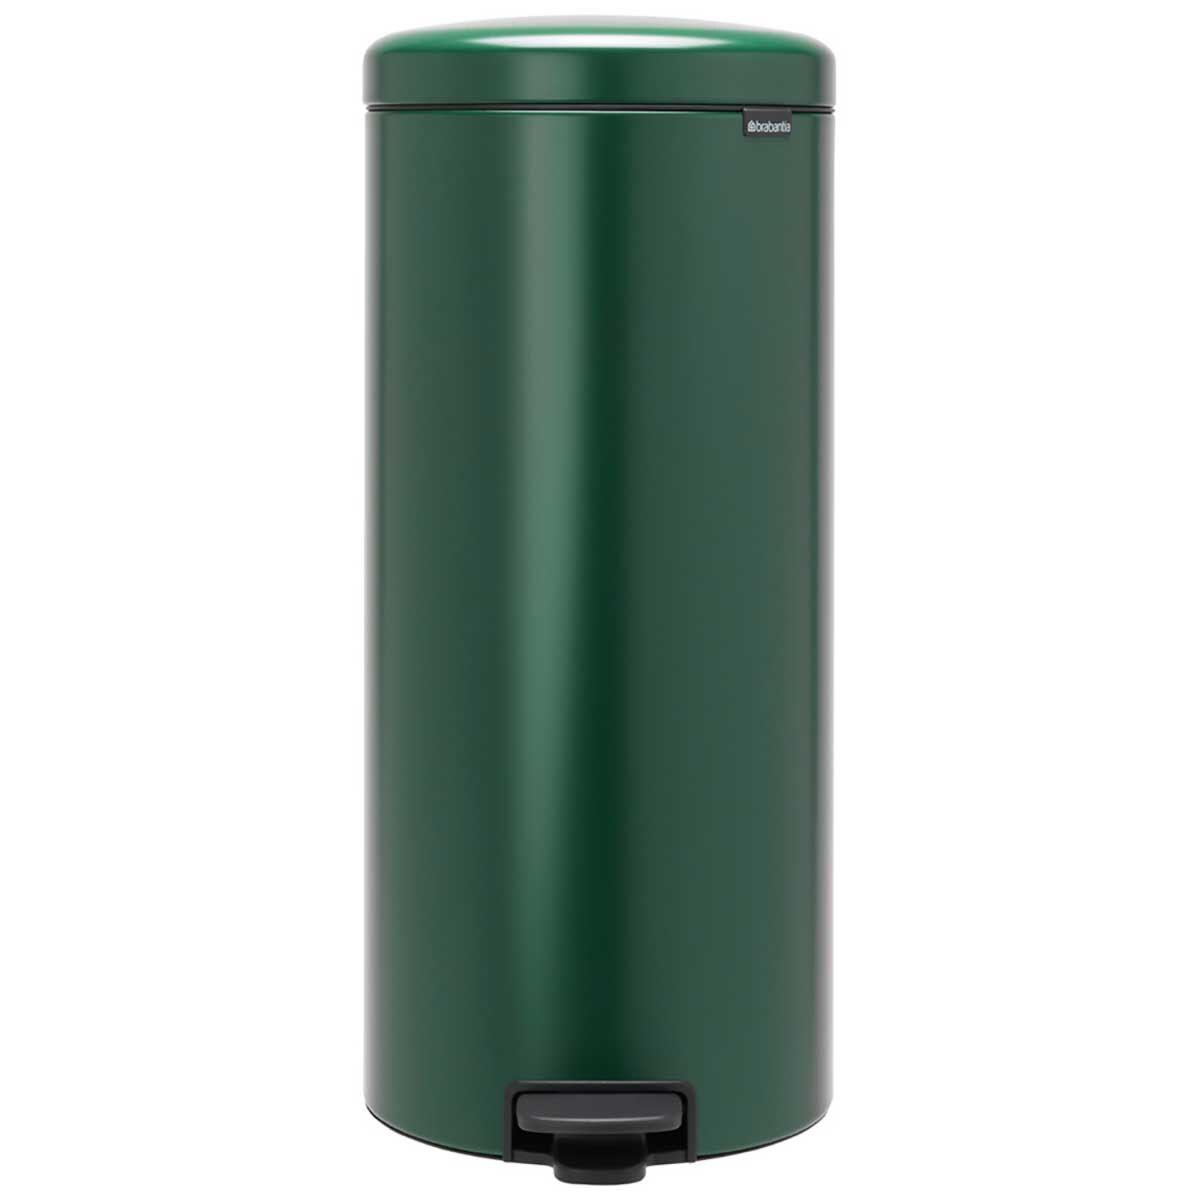 Brabantia NewIcon Soft Closing Pedal Bin 30 Litre Dark Green